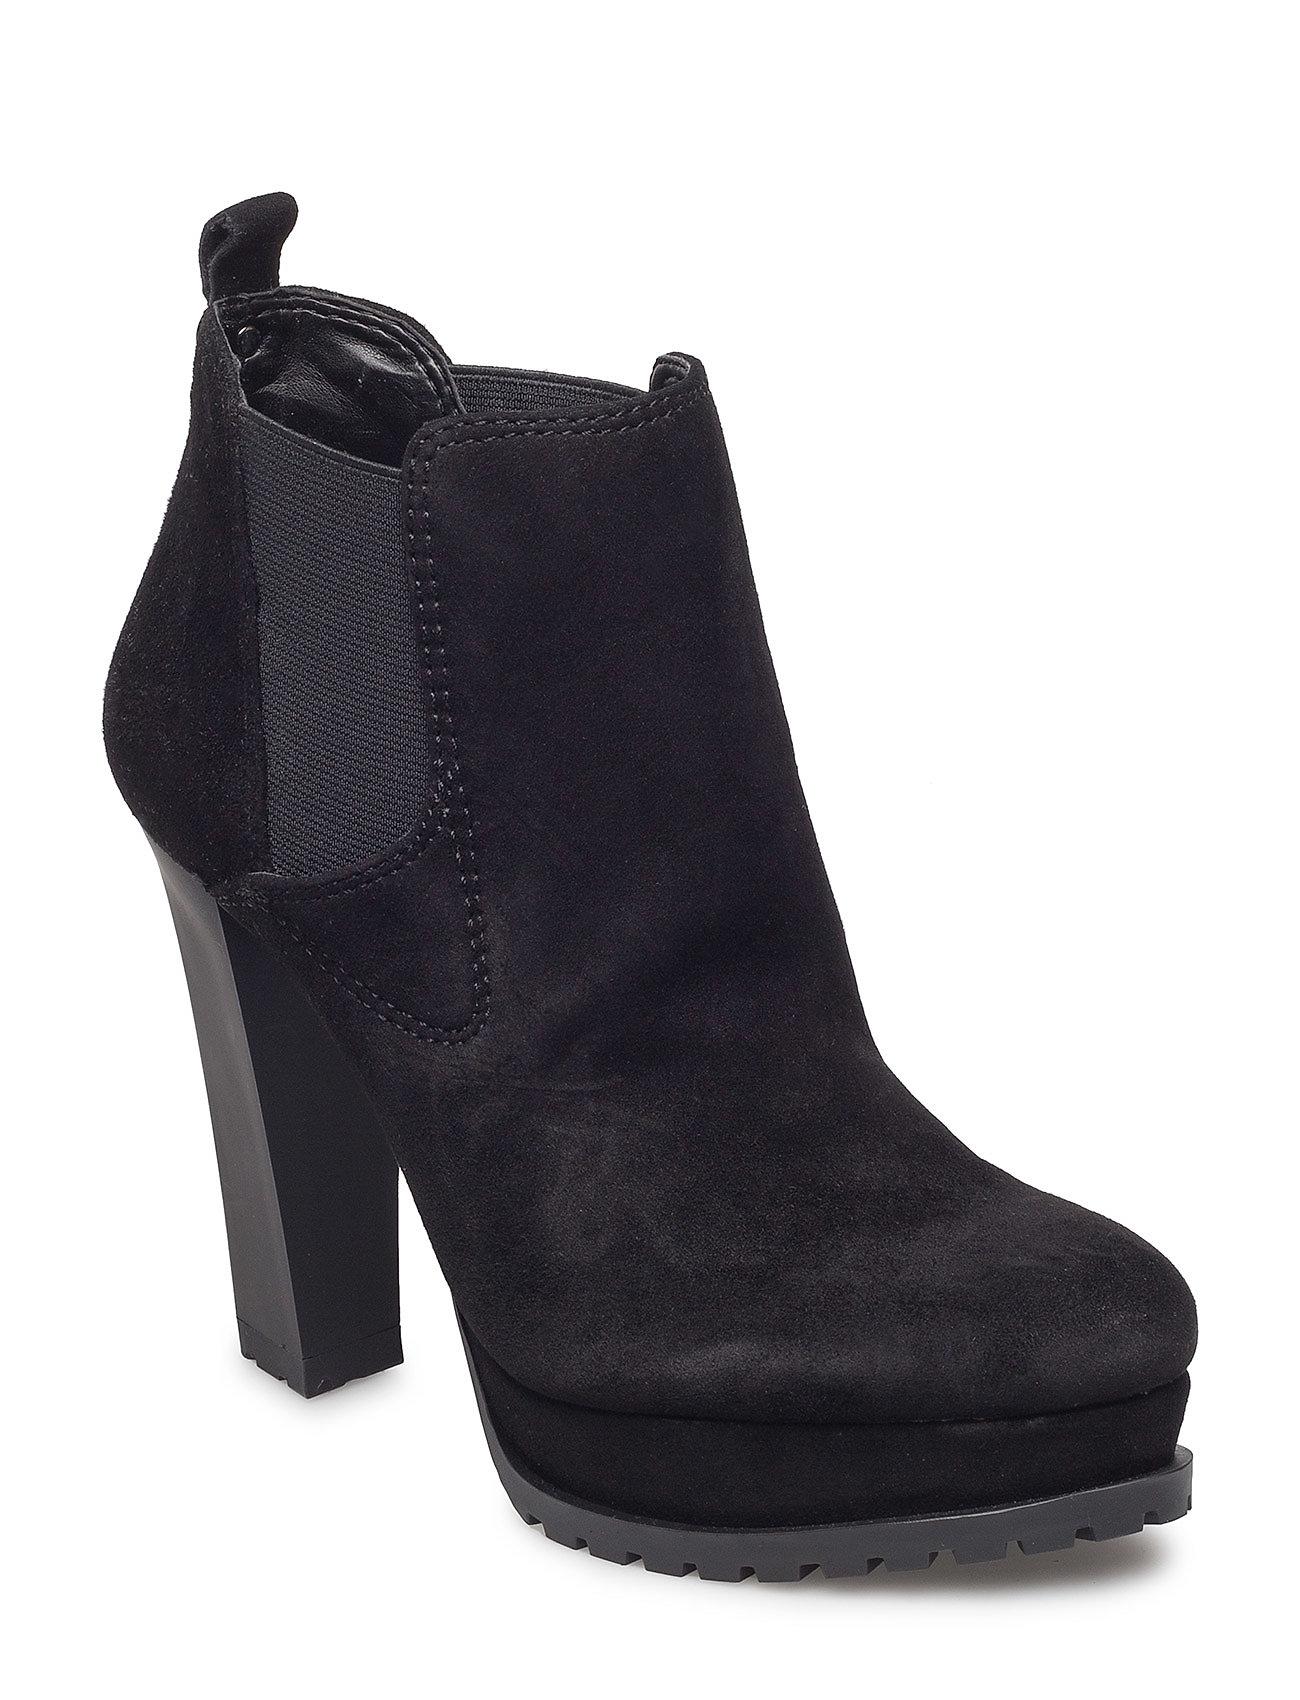 Rita shootie (ankle Boot) sue (Black) (105 €) - GUESS - Schoenen ... 17e4b5dc09